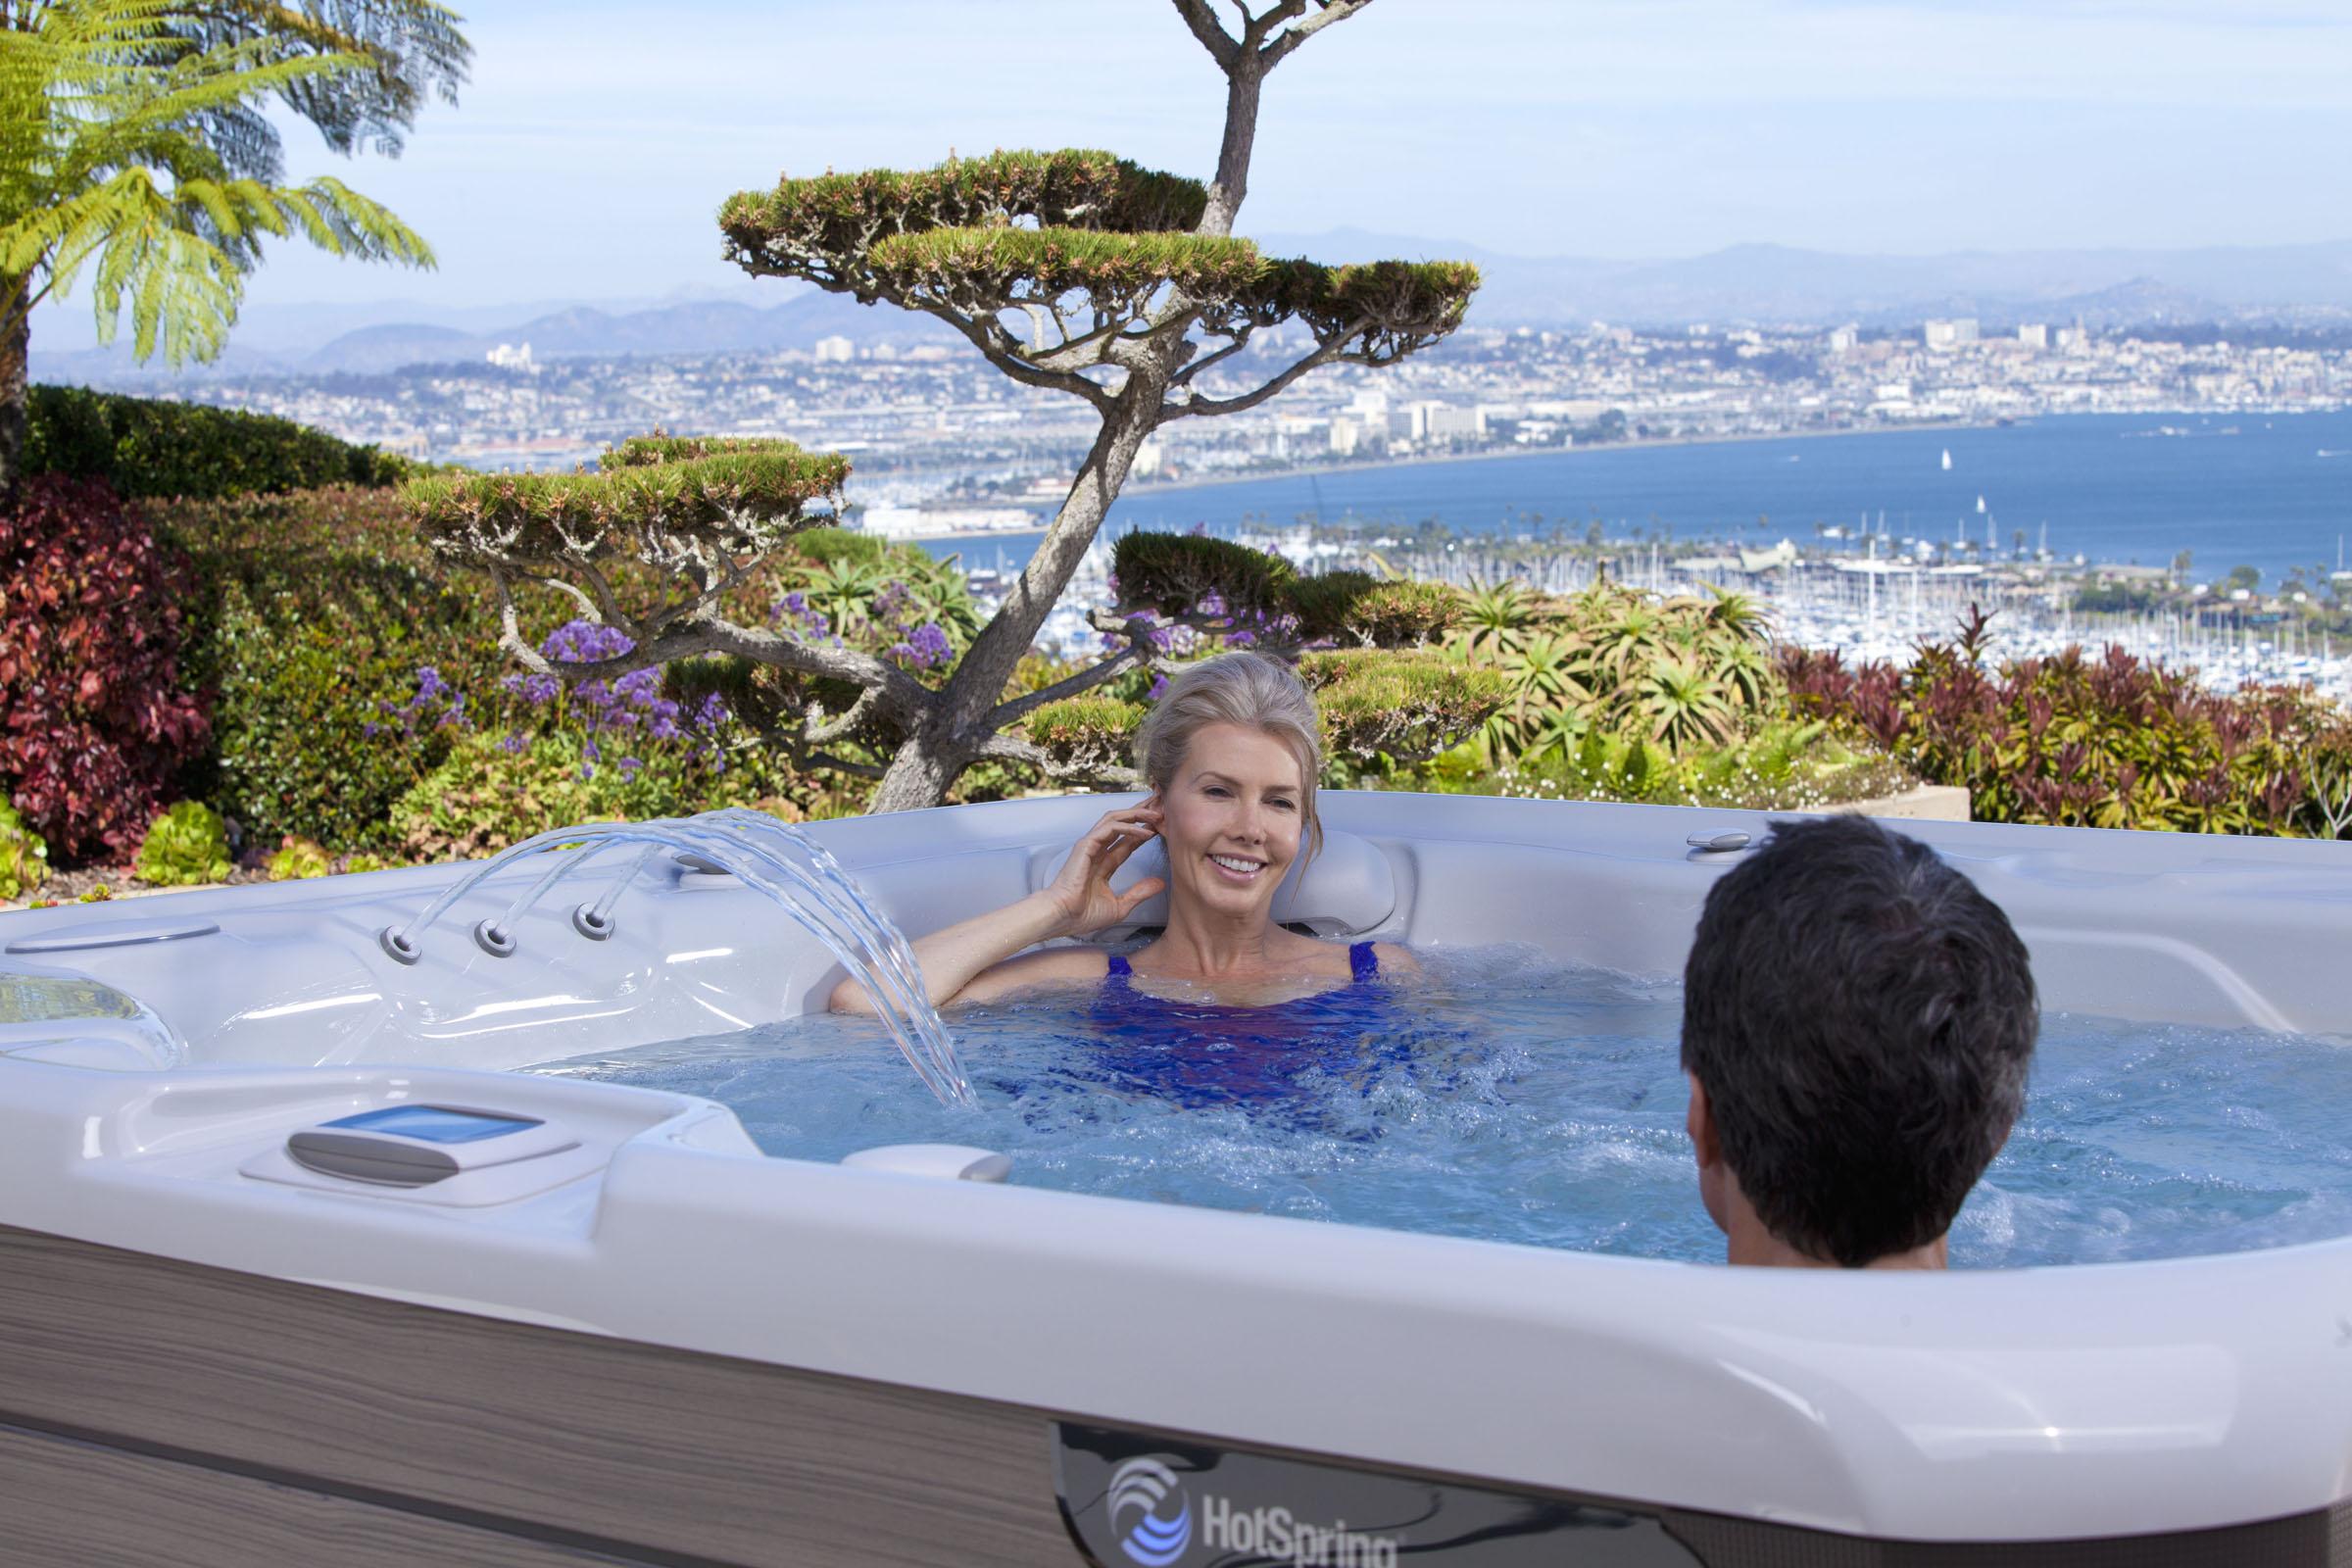 hotspring prism spas new hero spa spring person limelight hot all model for tub shop models